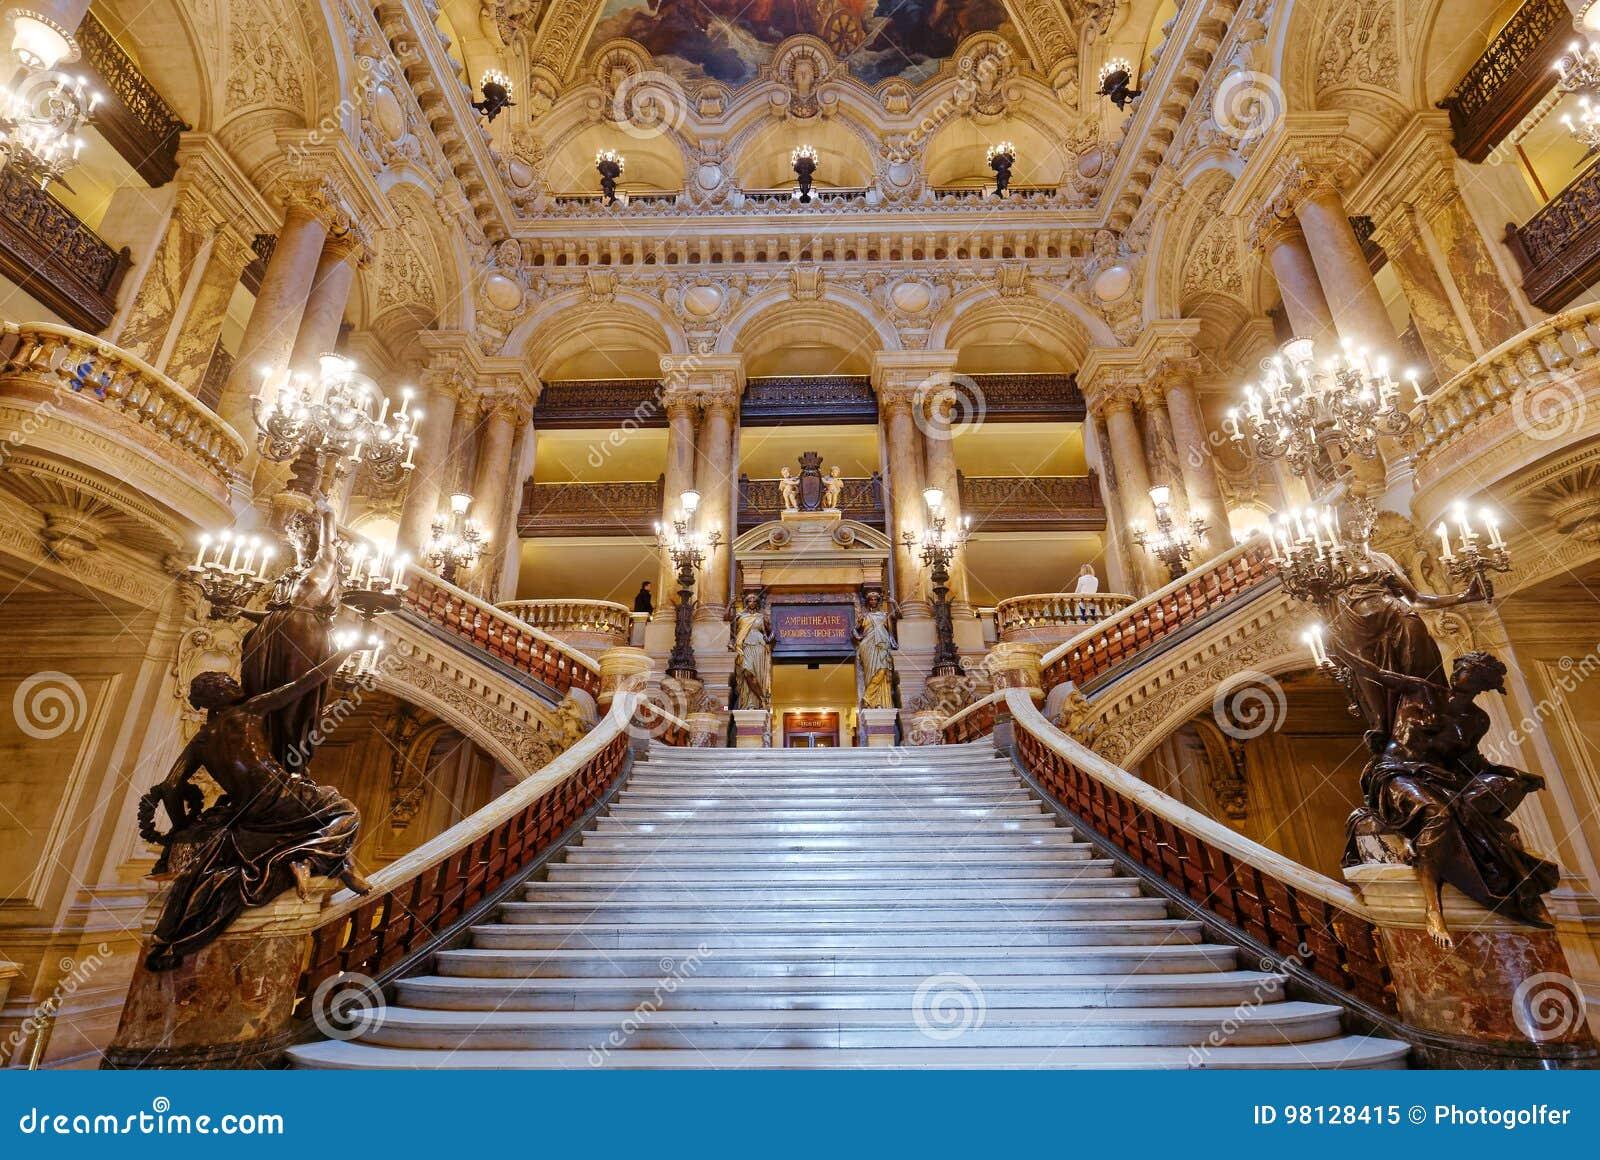 The Palais Garnier Opera Of Paris Interiors And Details Editorial